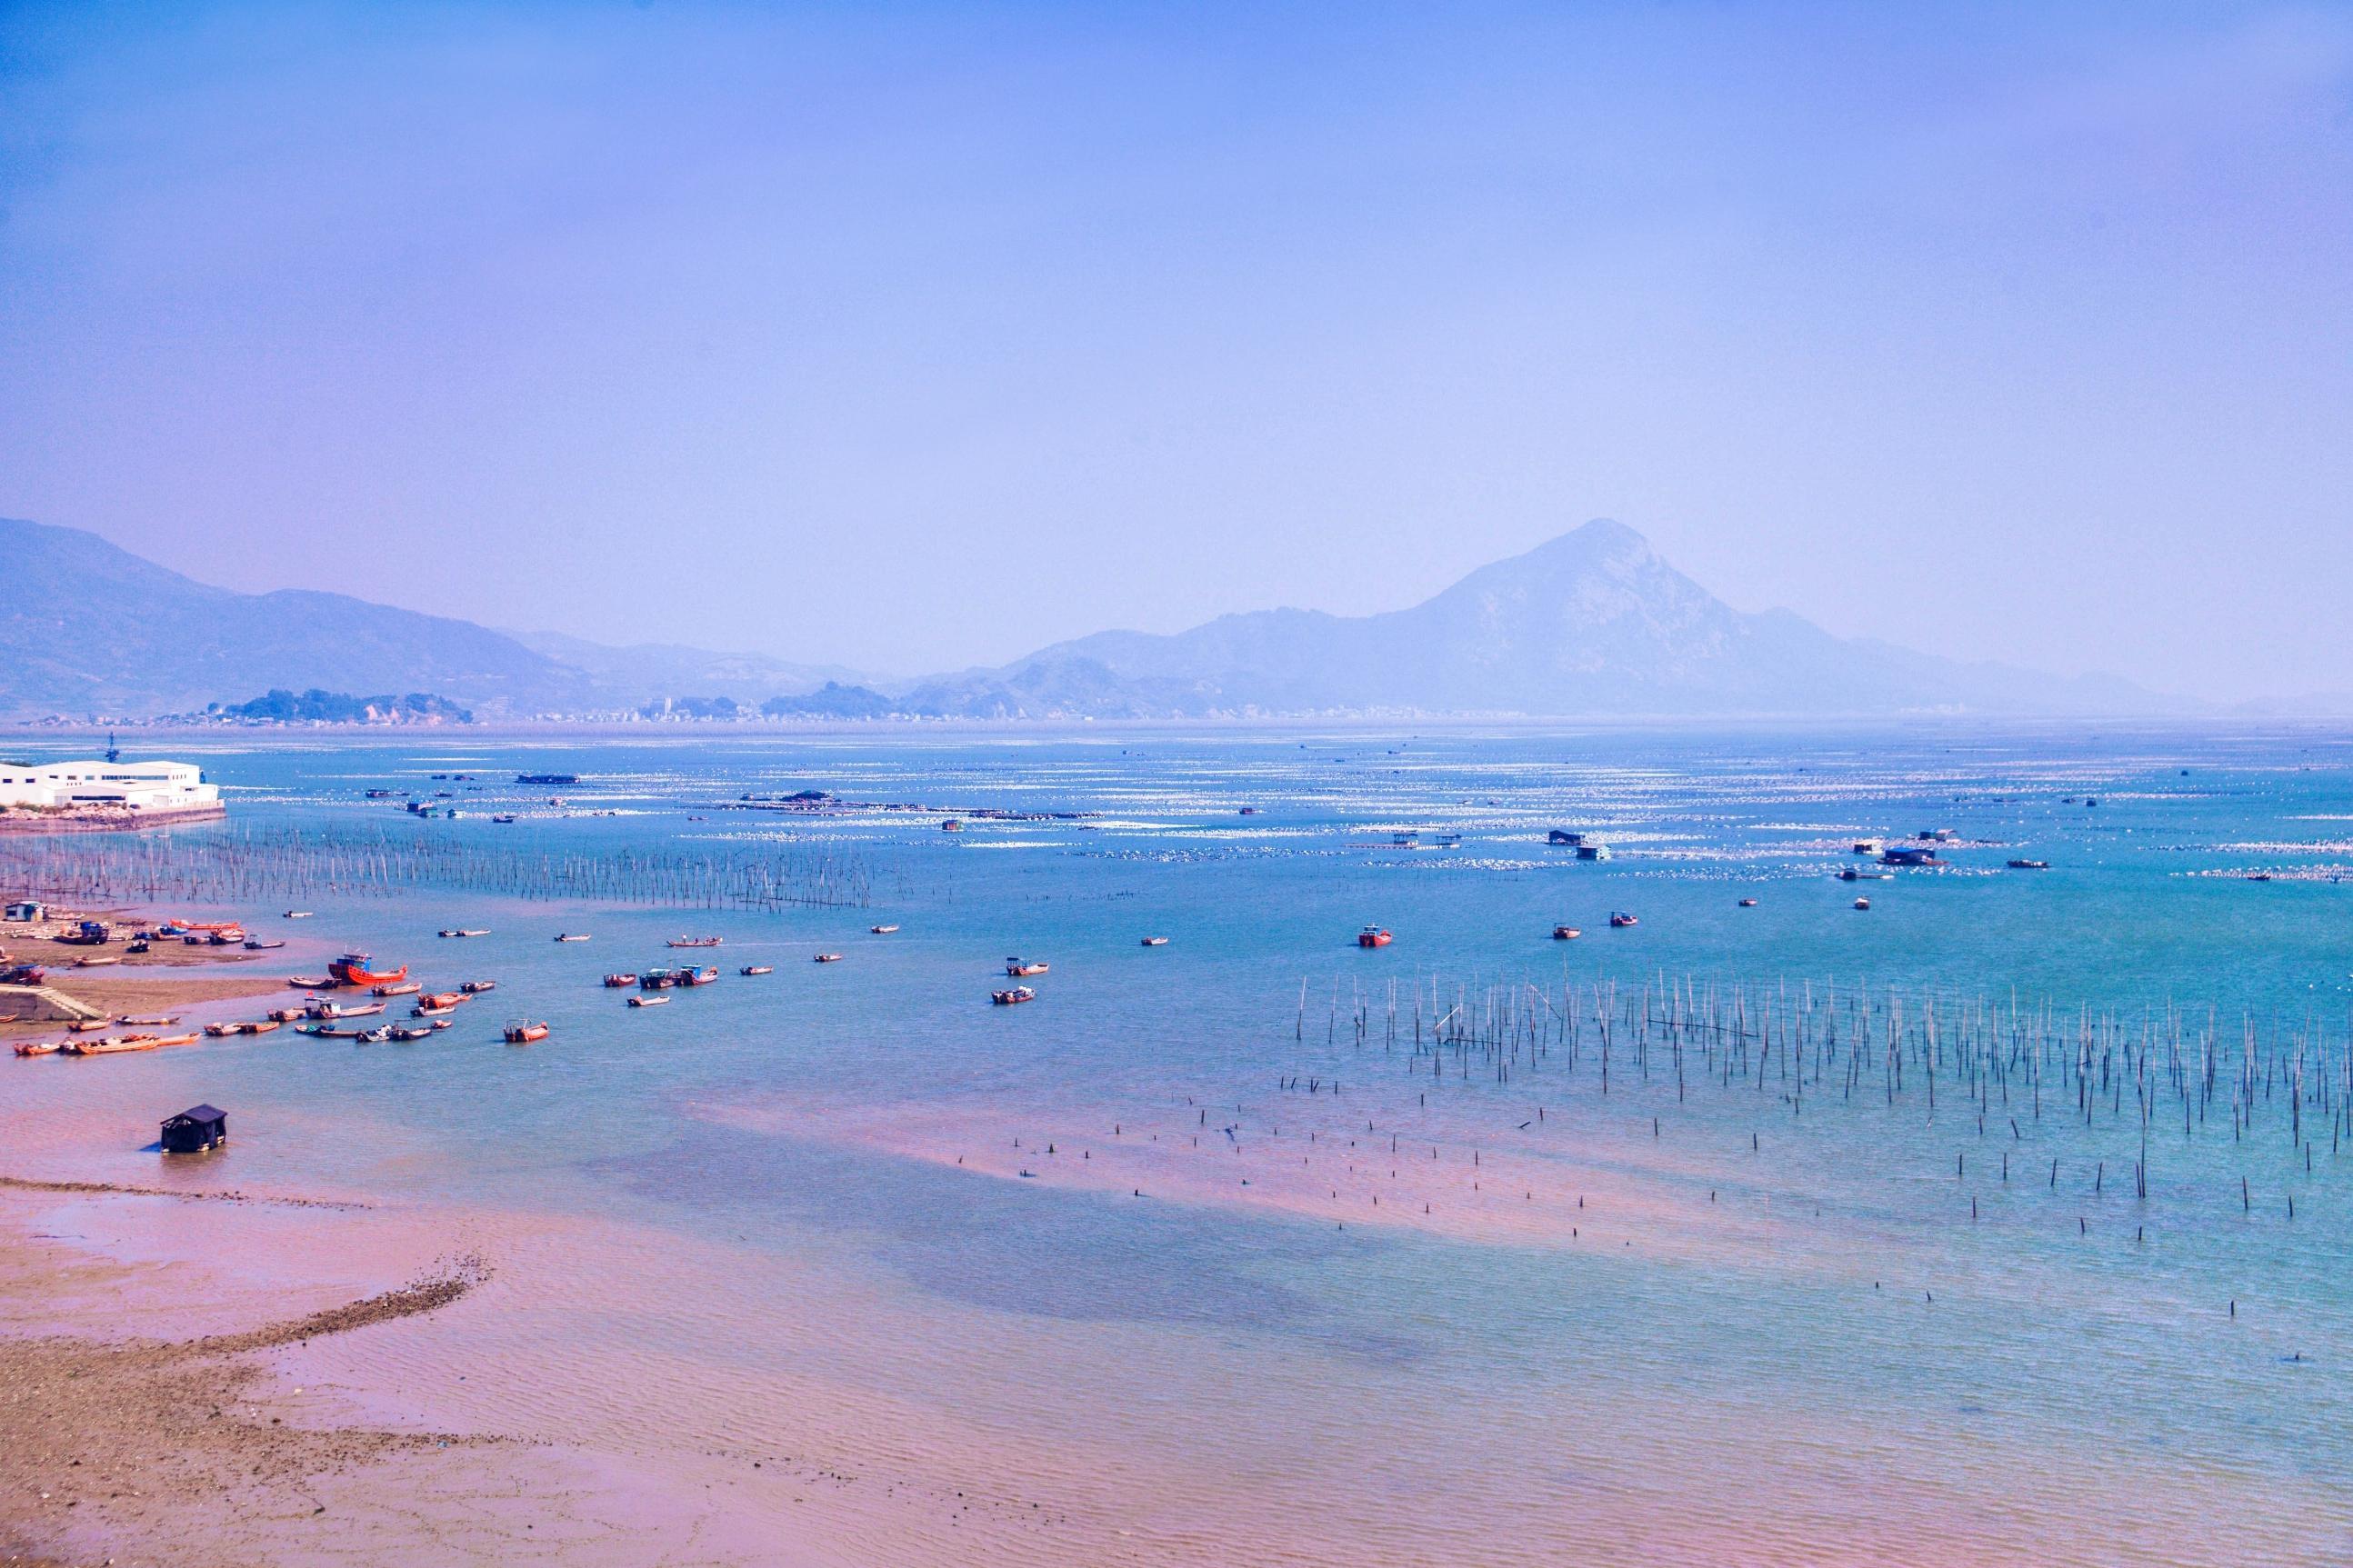 Xiapu Dajing Sand Beach